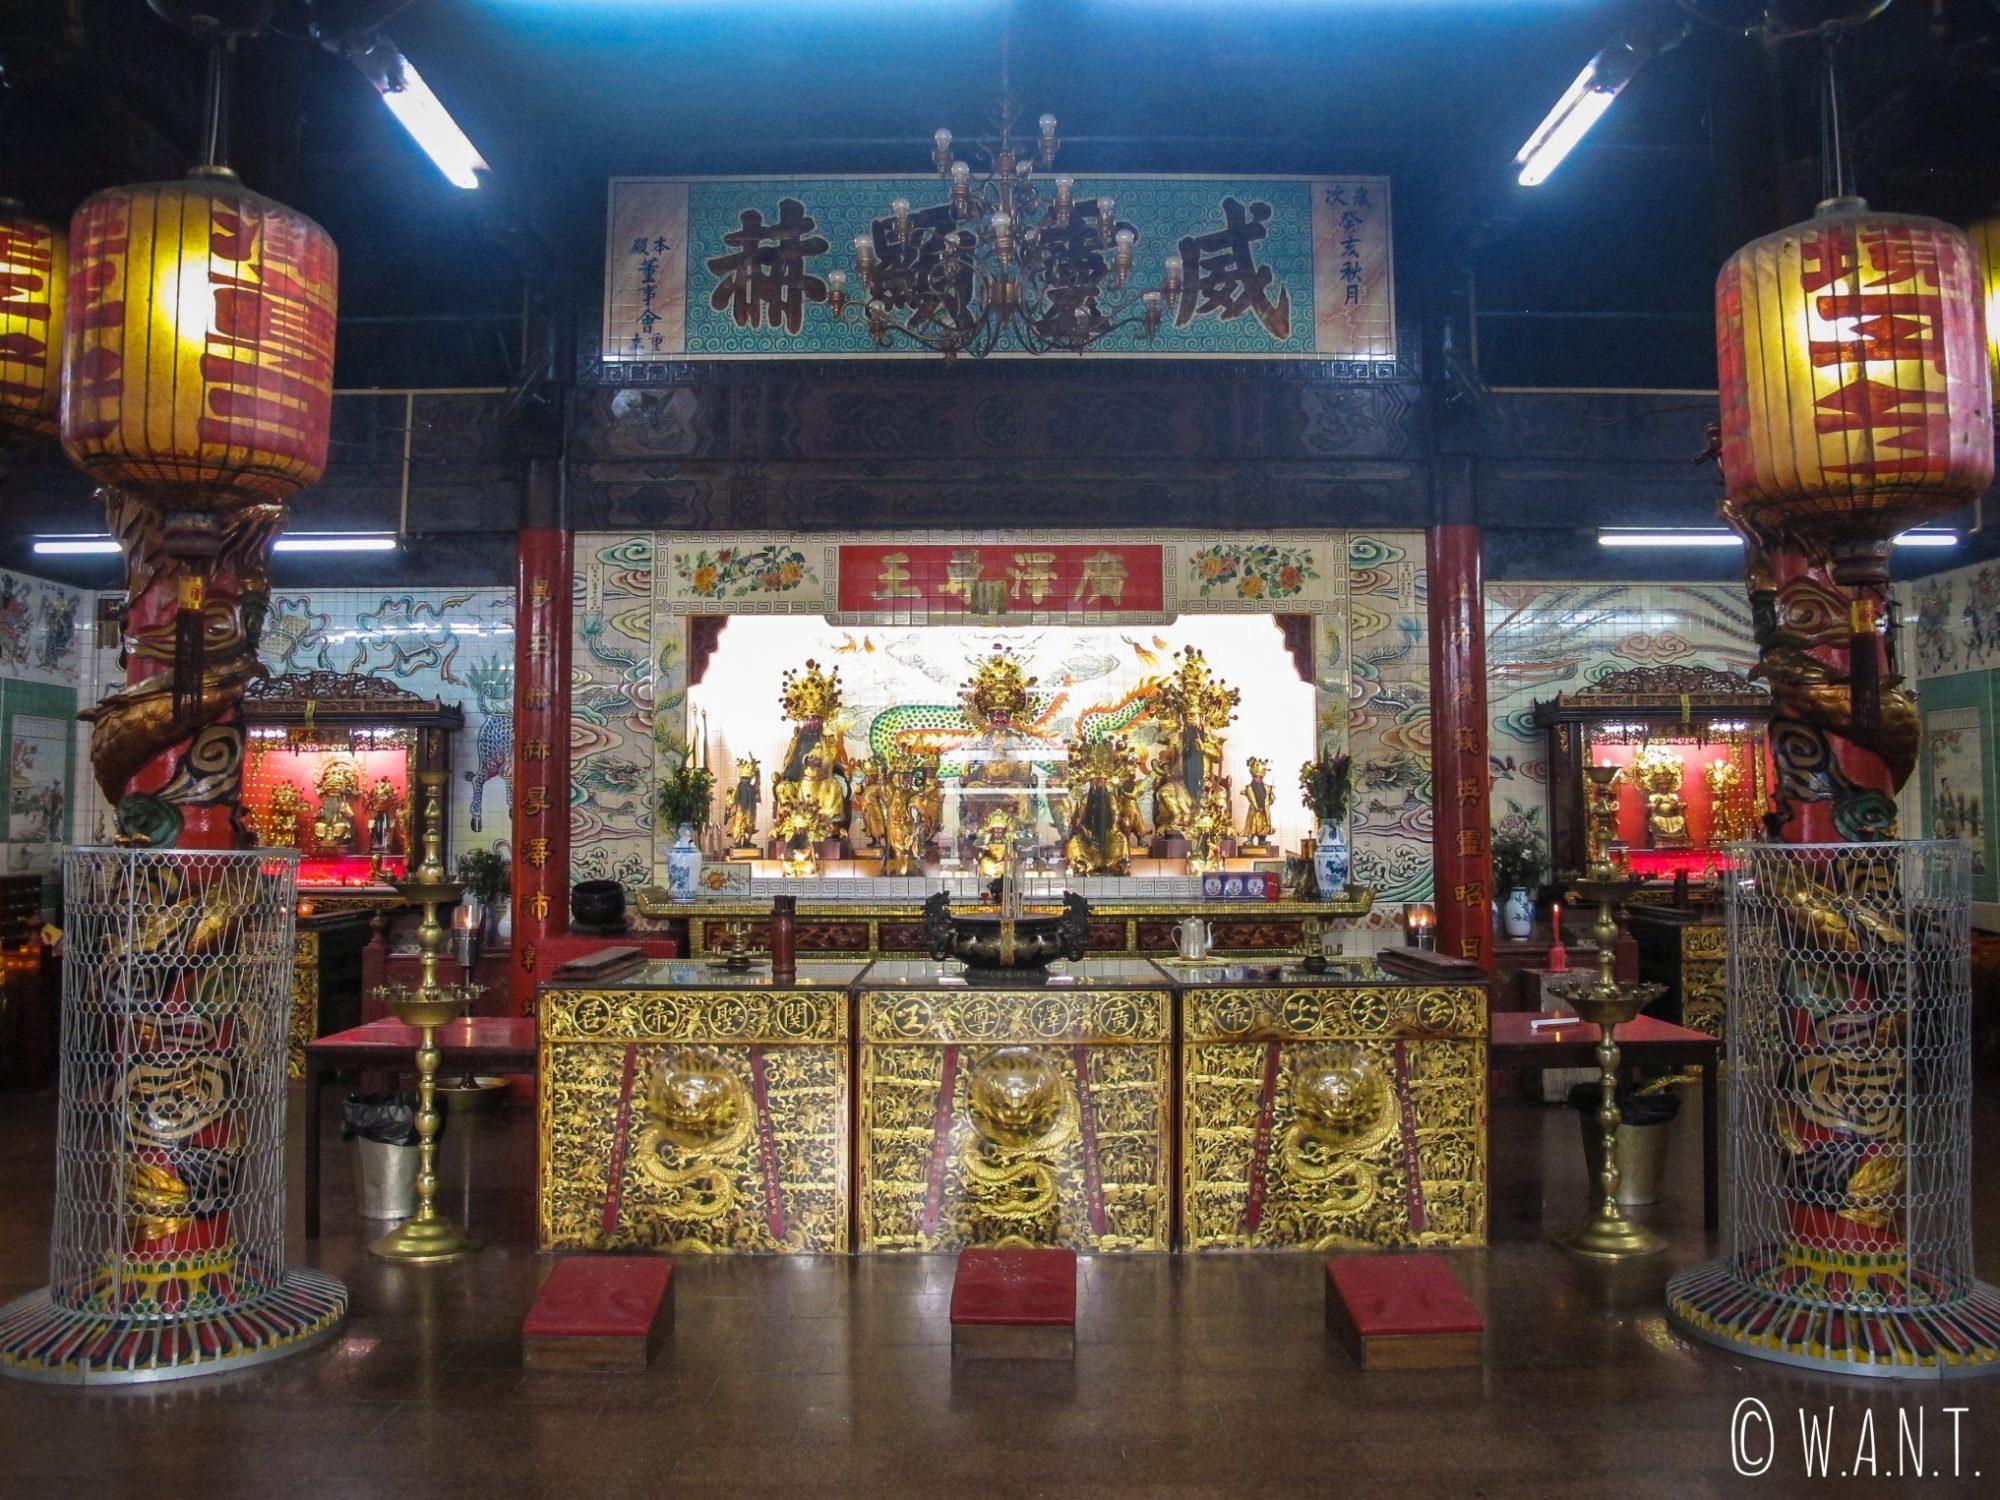 Intérieur du Teng Yun Temple de Bandar Seri Begawan